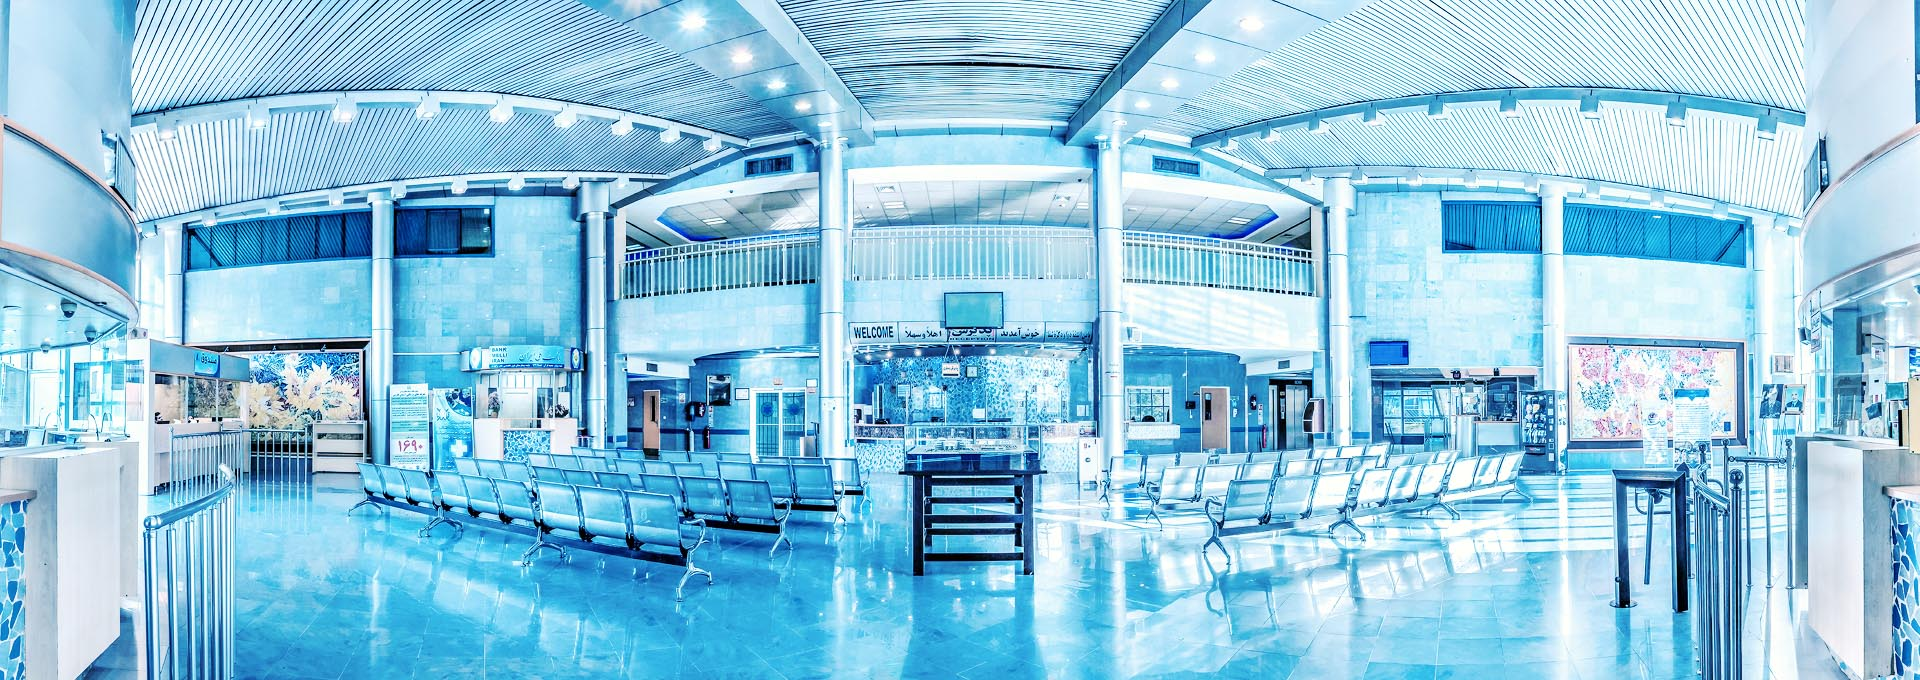 بزرگترين مركز تخصصي جراحي زيبايي در جنوب كشور